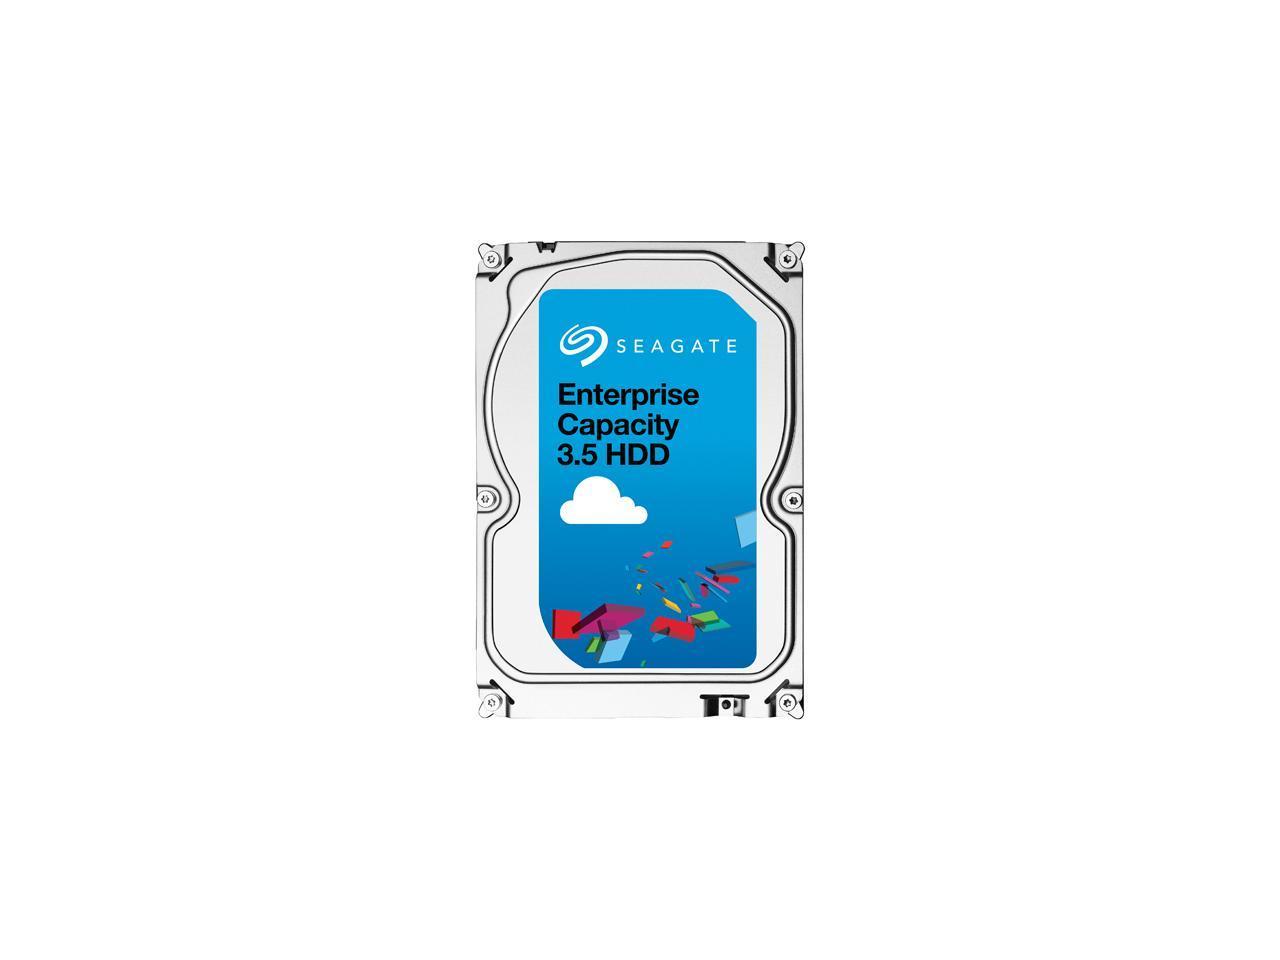 Seagate Enterprise Capacity 3.5 HDD 6TB $170